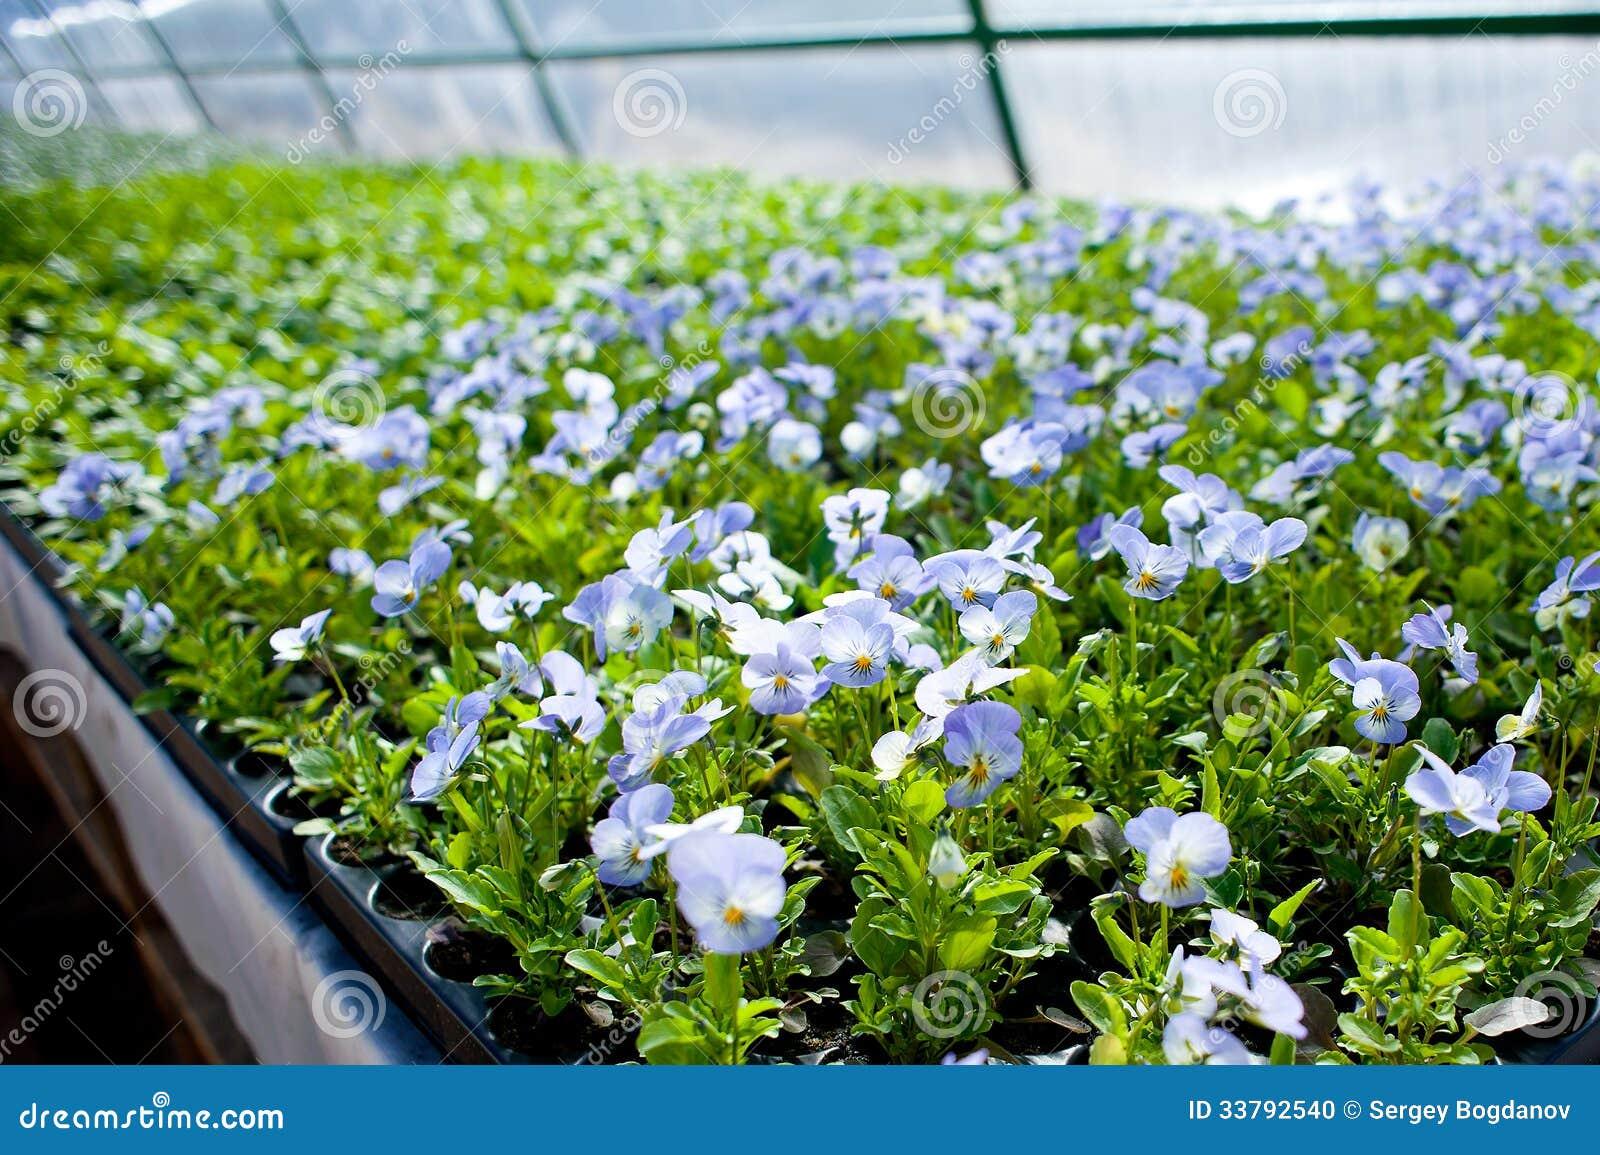 Plant green house garden flower nursery stock photo for Green plants for landscaping